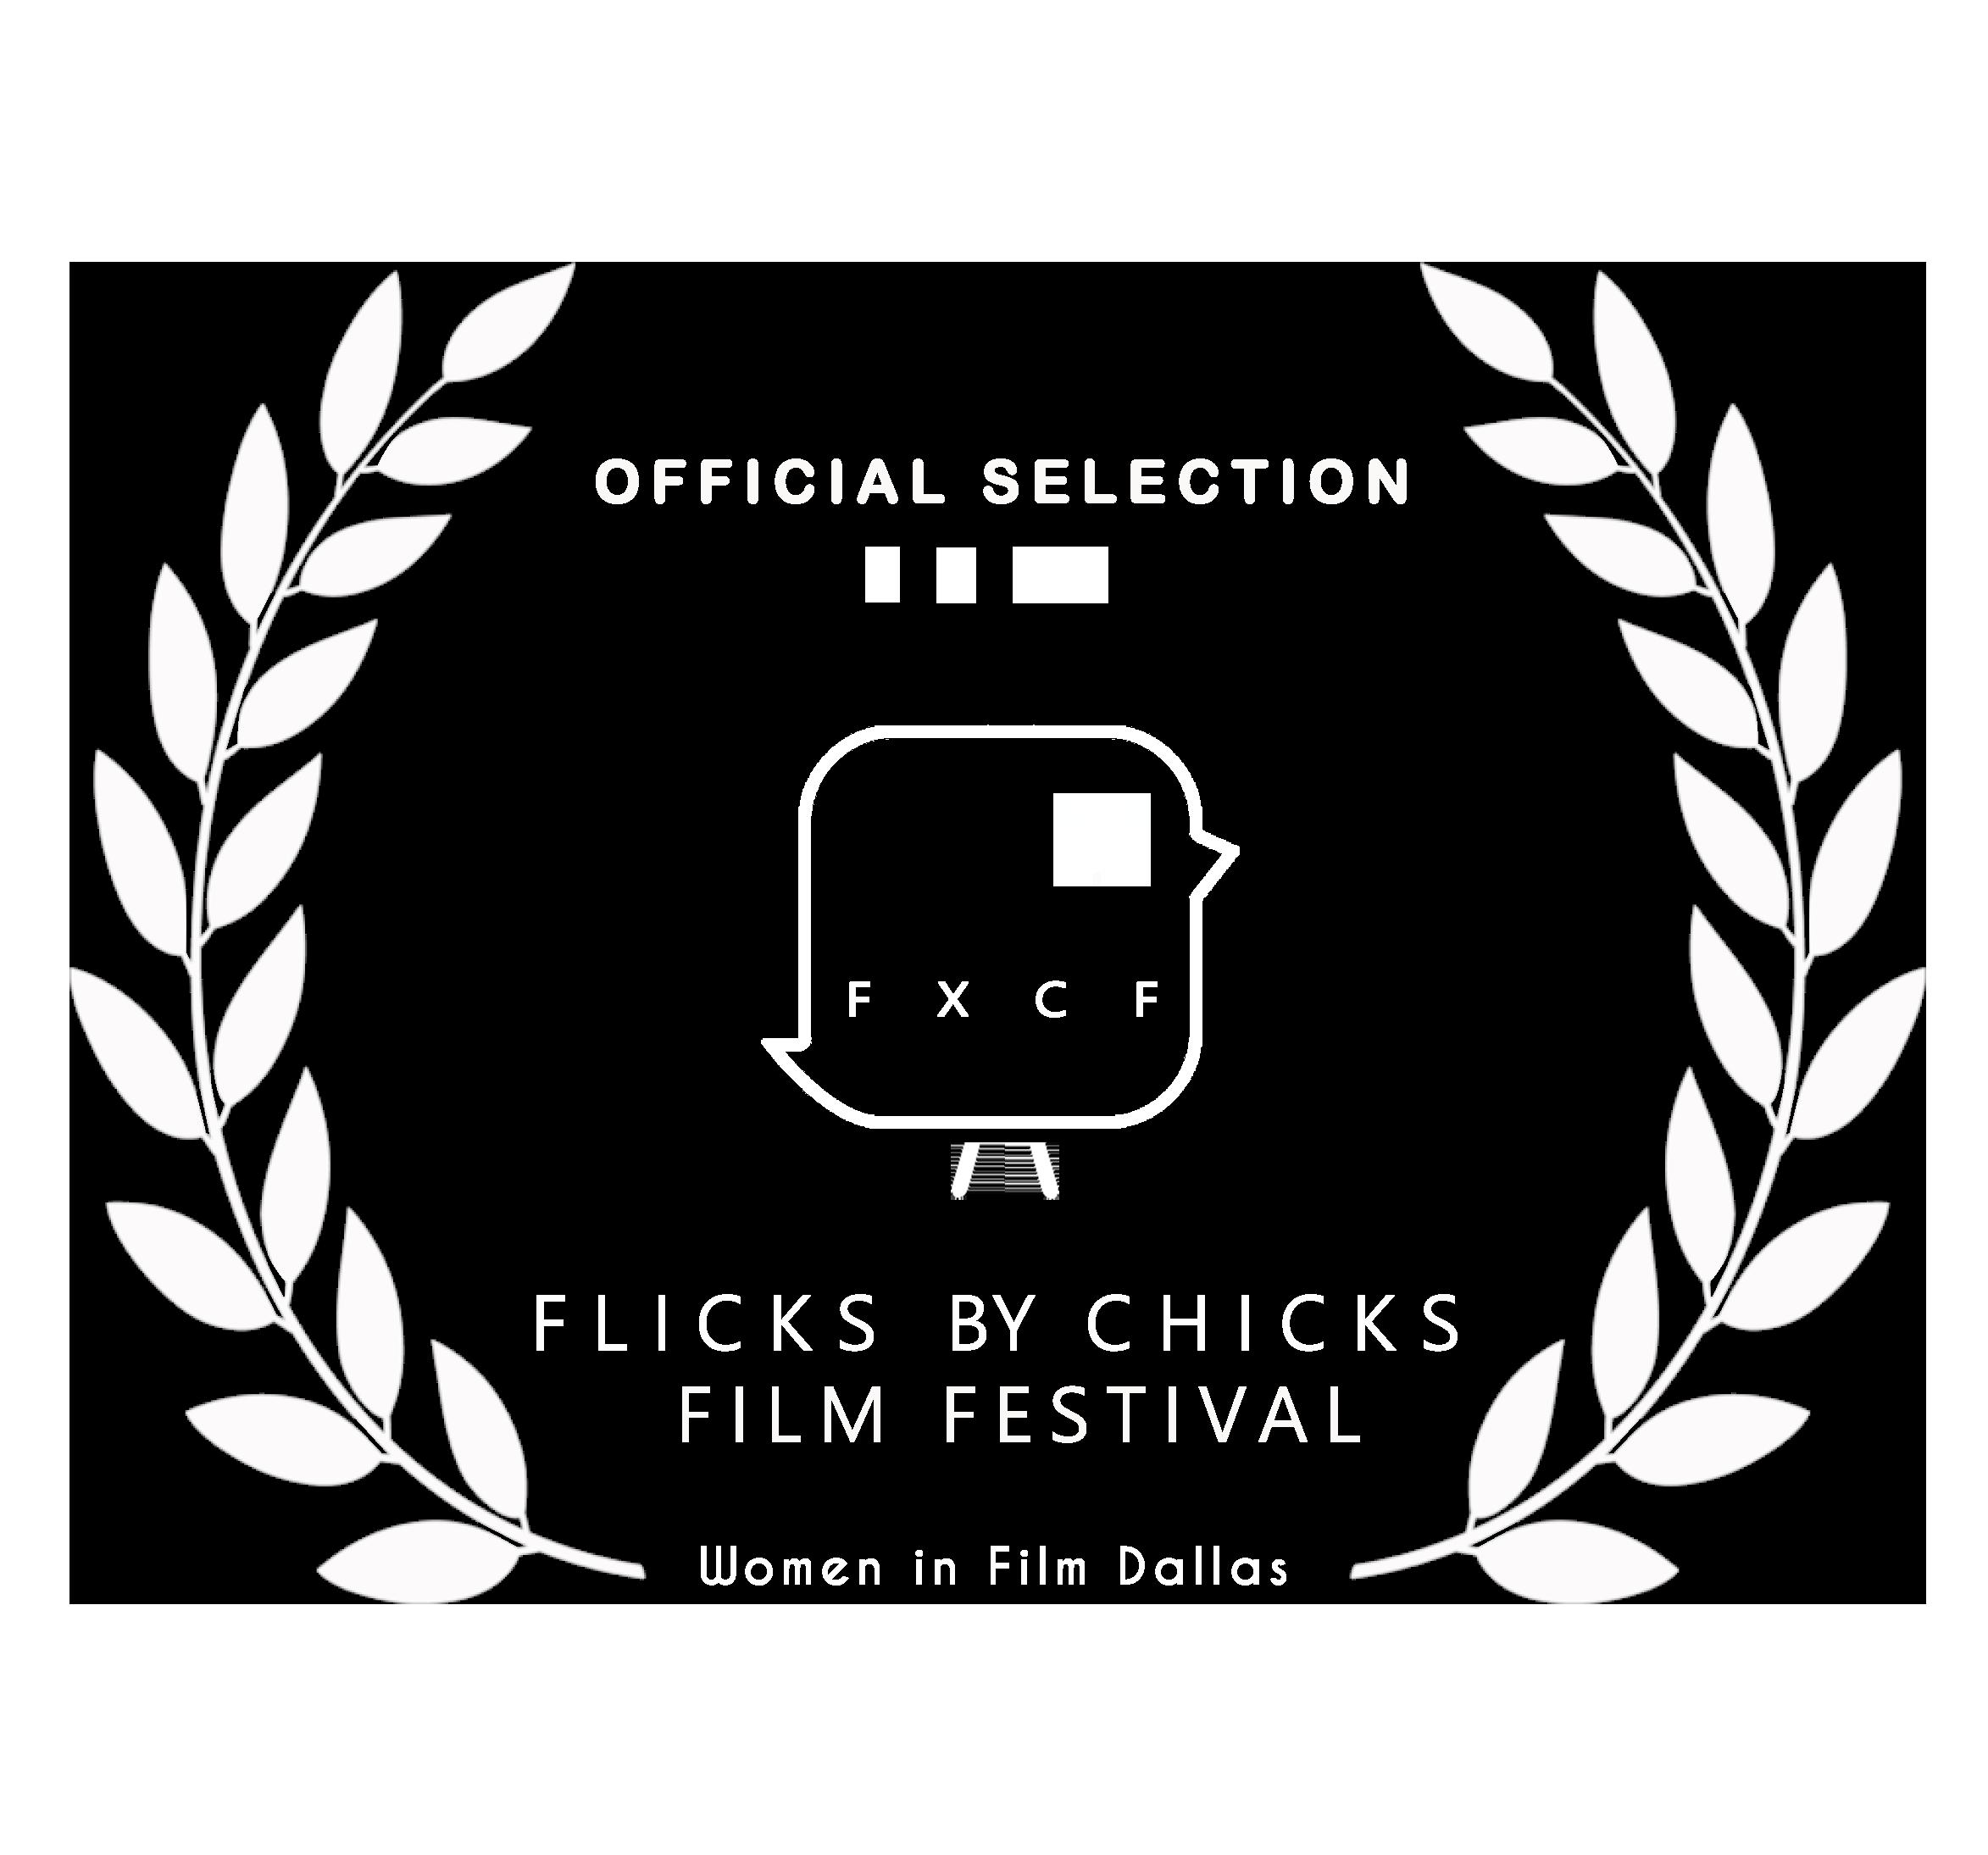 FXCF Laurel Official Selection 2018 copy.png